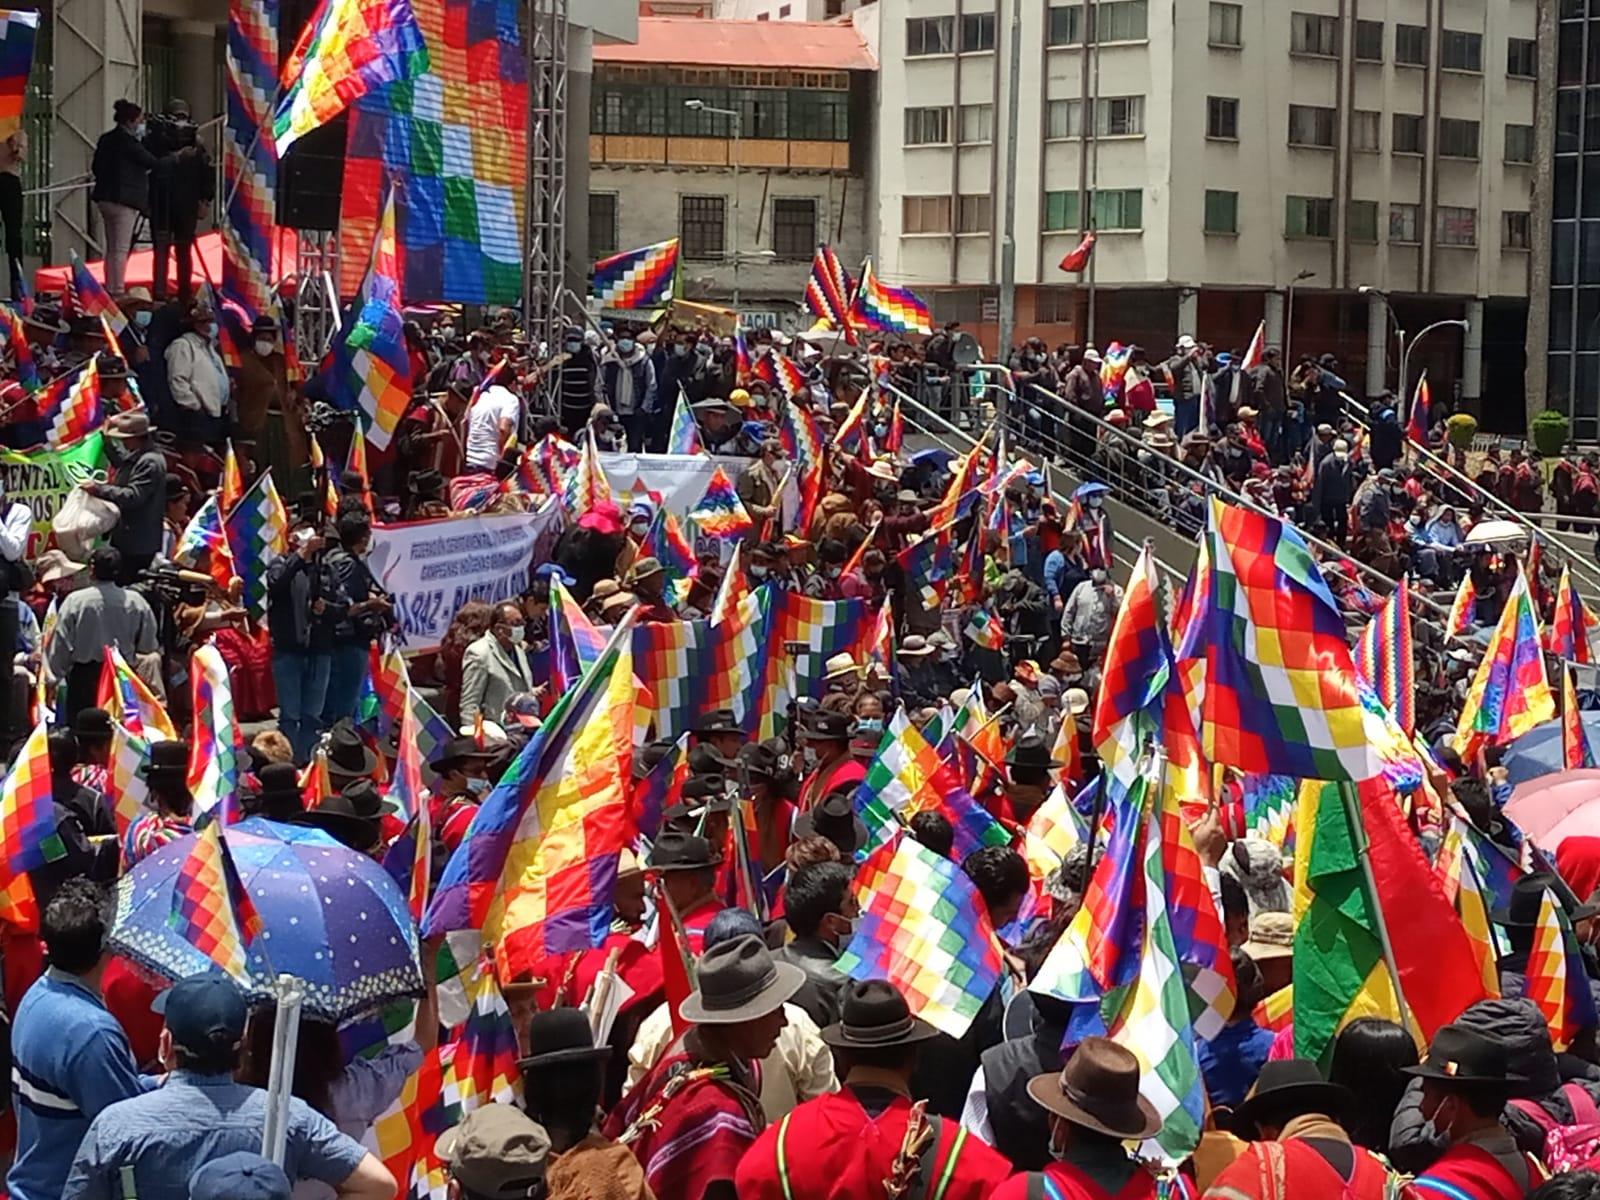 Bolivia: marchas y whipalazo contra el golpismo latente